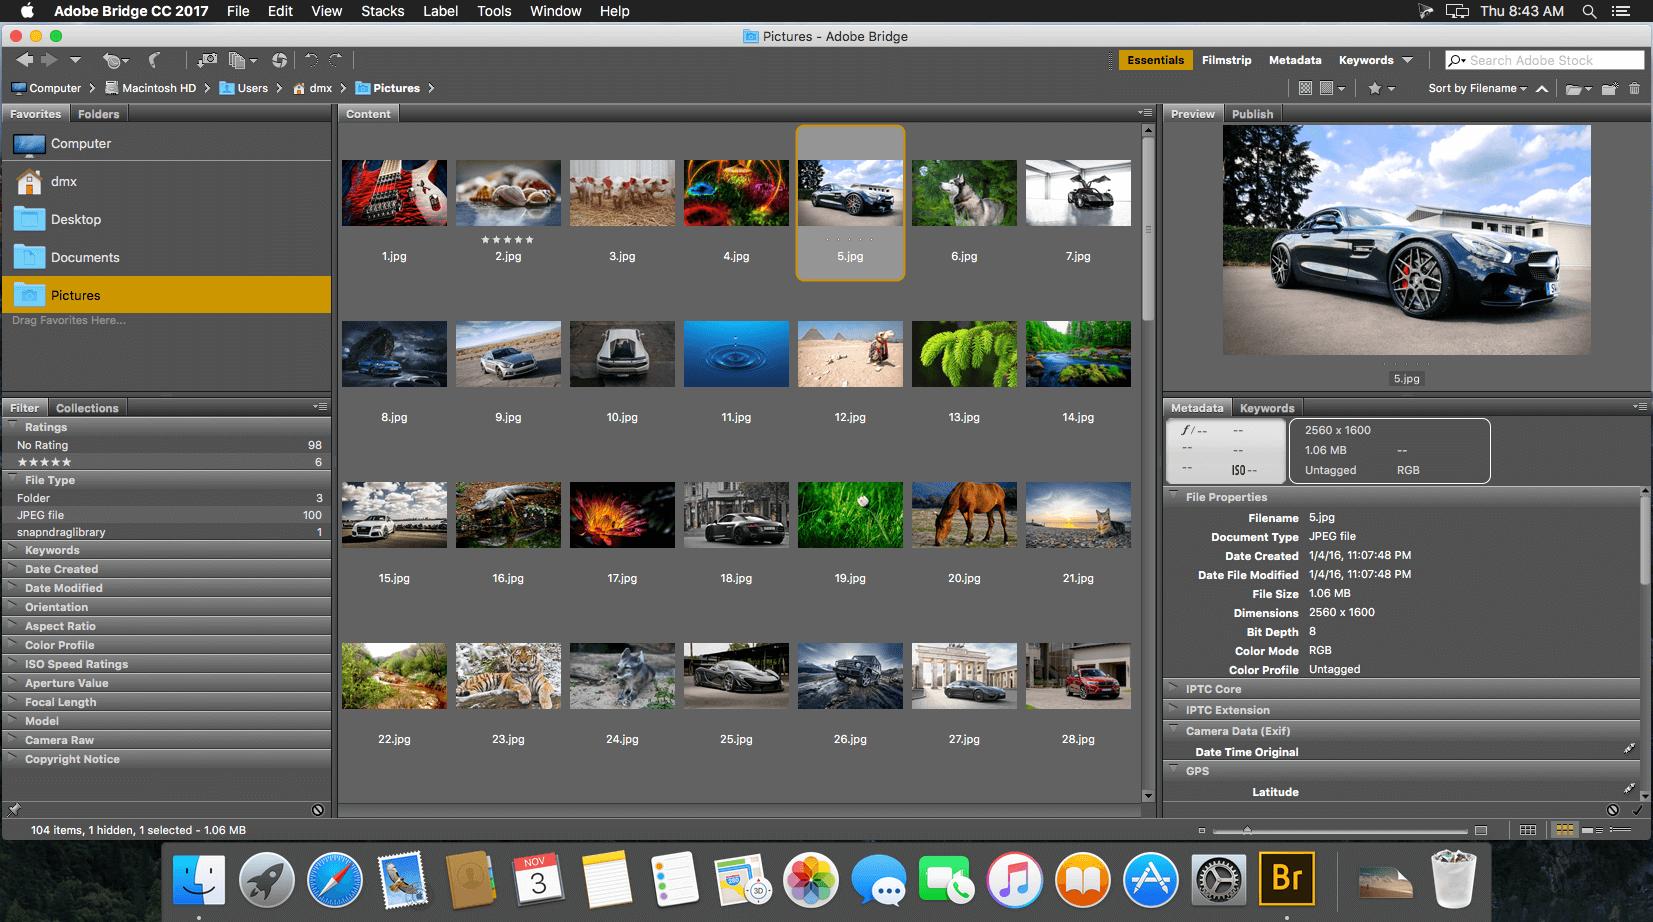 Image result for Adobe_Bridge_CC_2017.